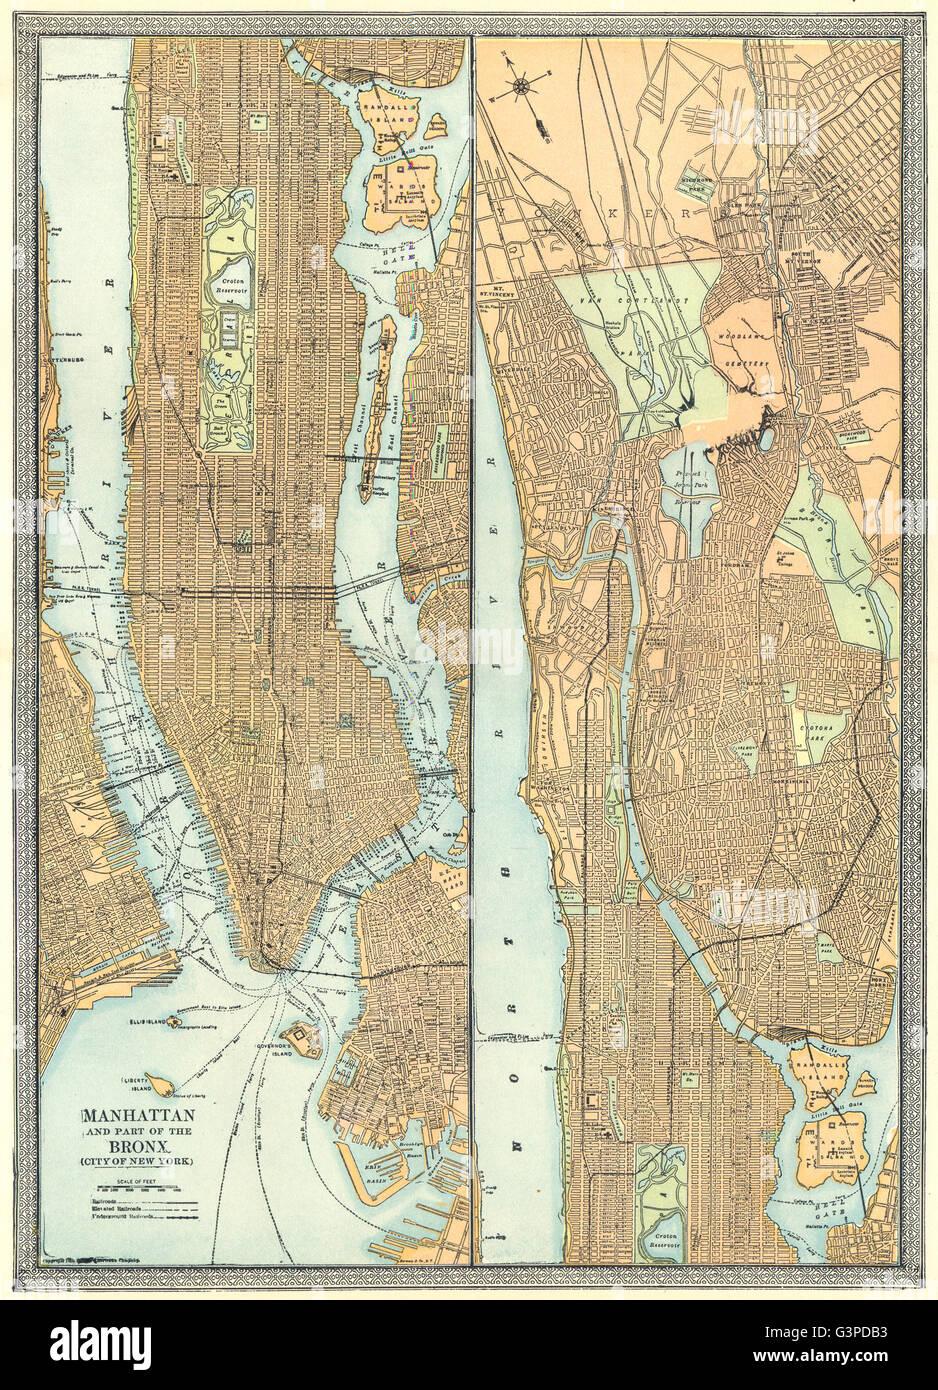 Map Of New York Bronx.Manhattan Town City Plan Bronx New York City 1907 Antique Map